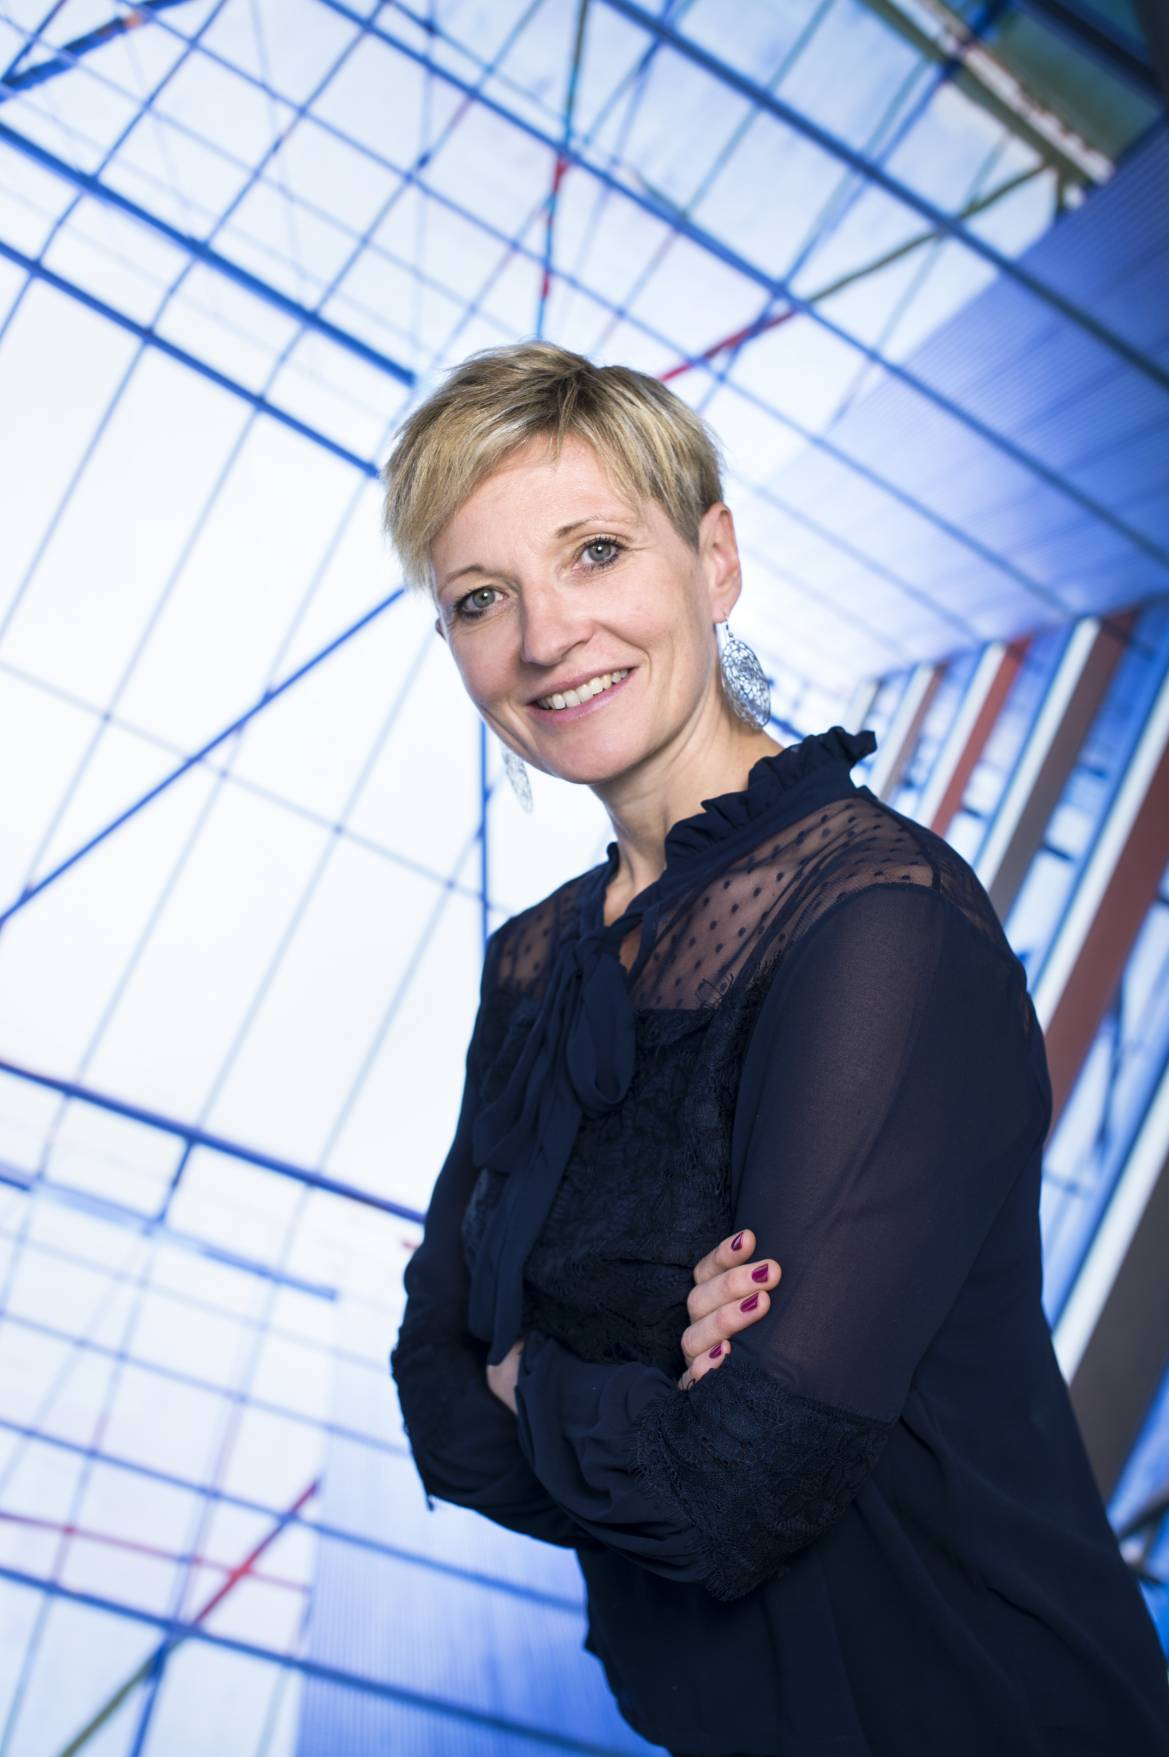 Christine Riou Feron